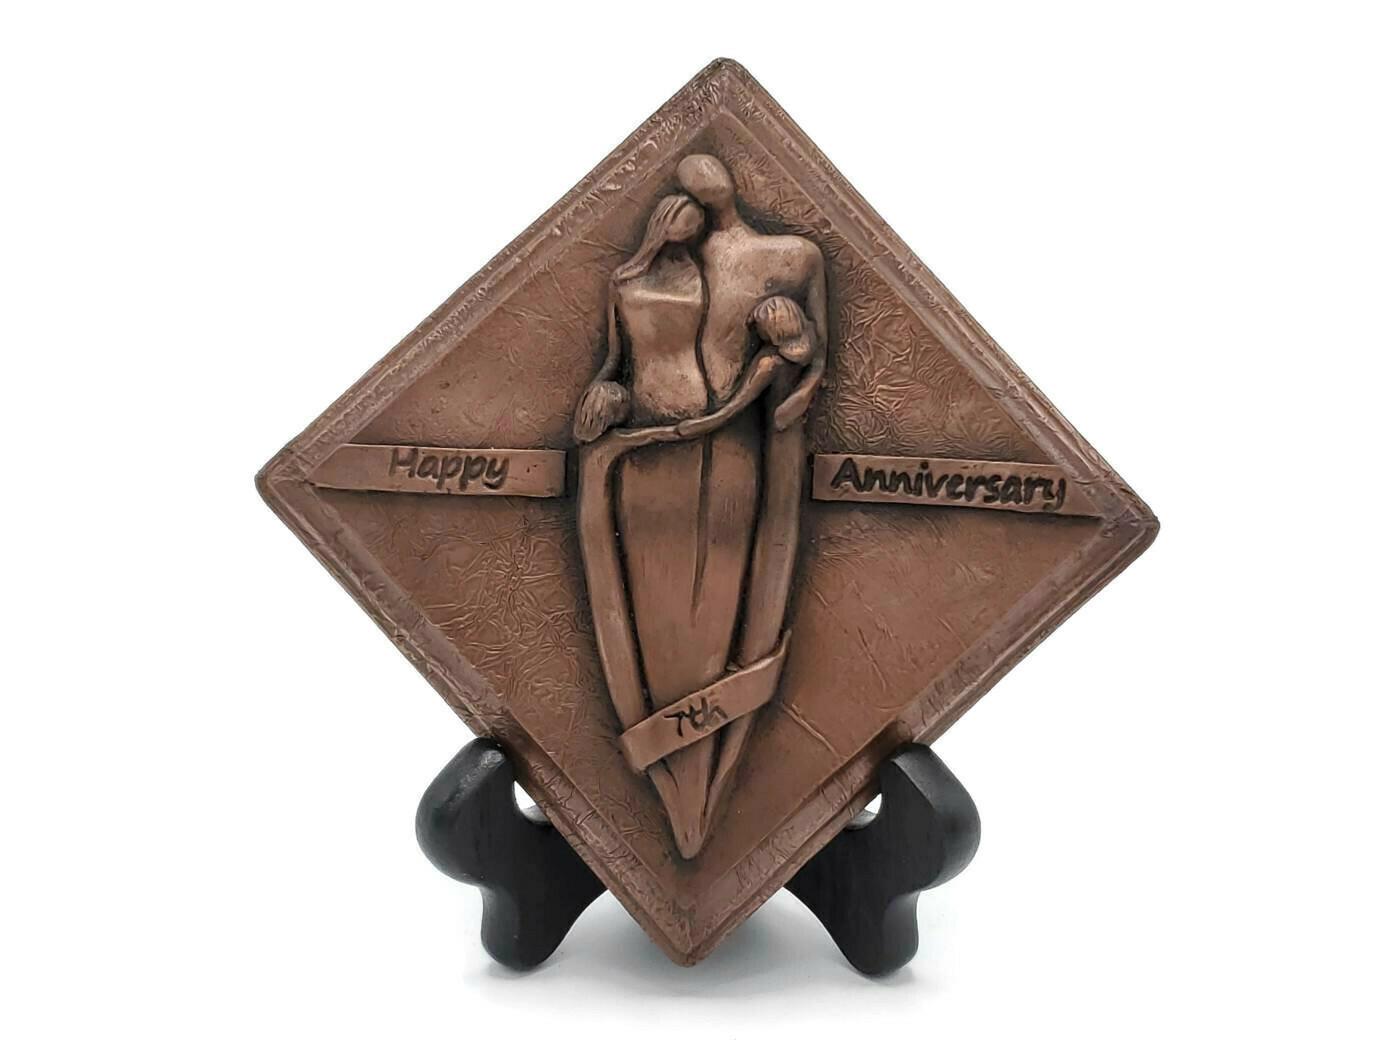 7th Anniversary Copper Plaque Family Sculpture Girls